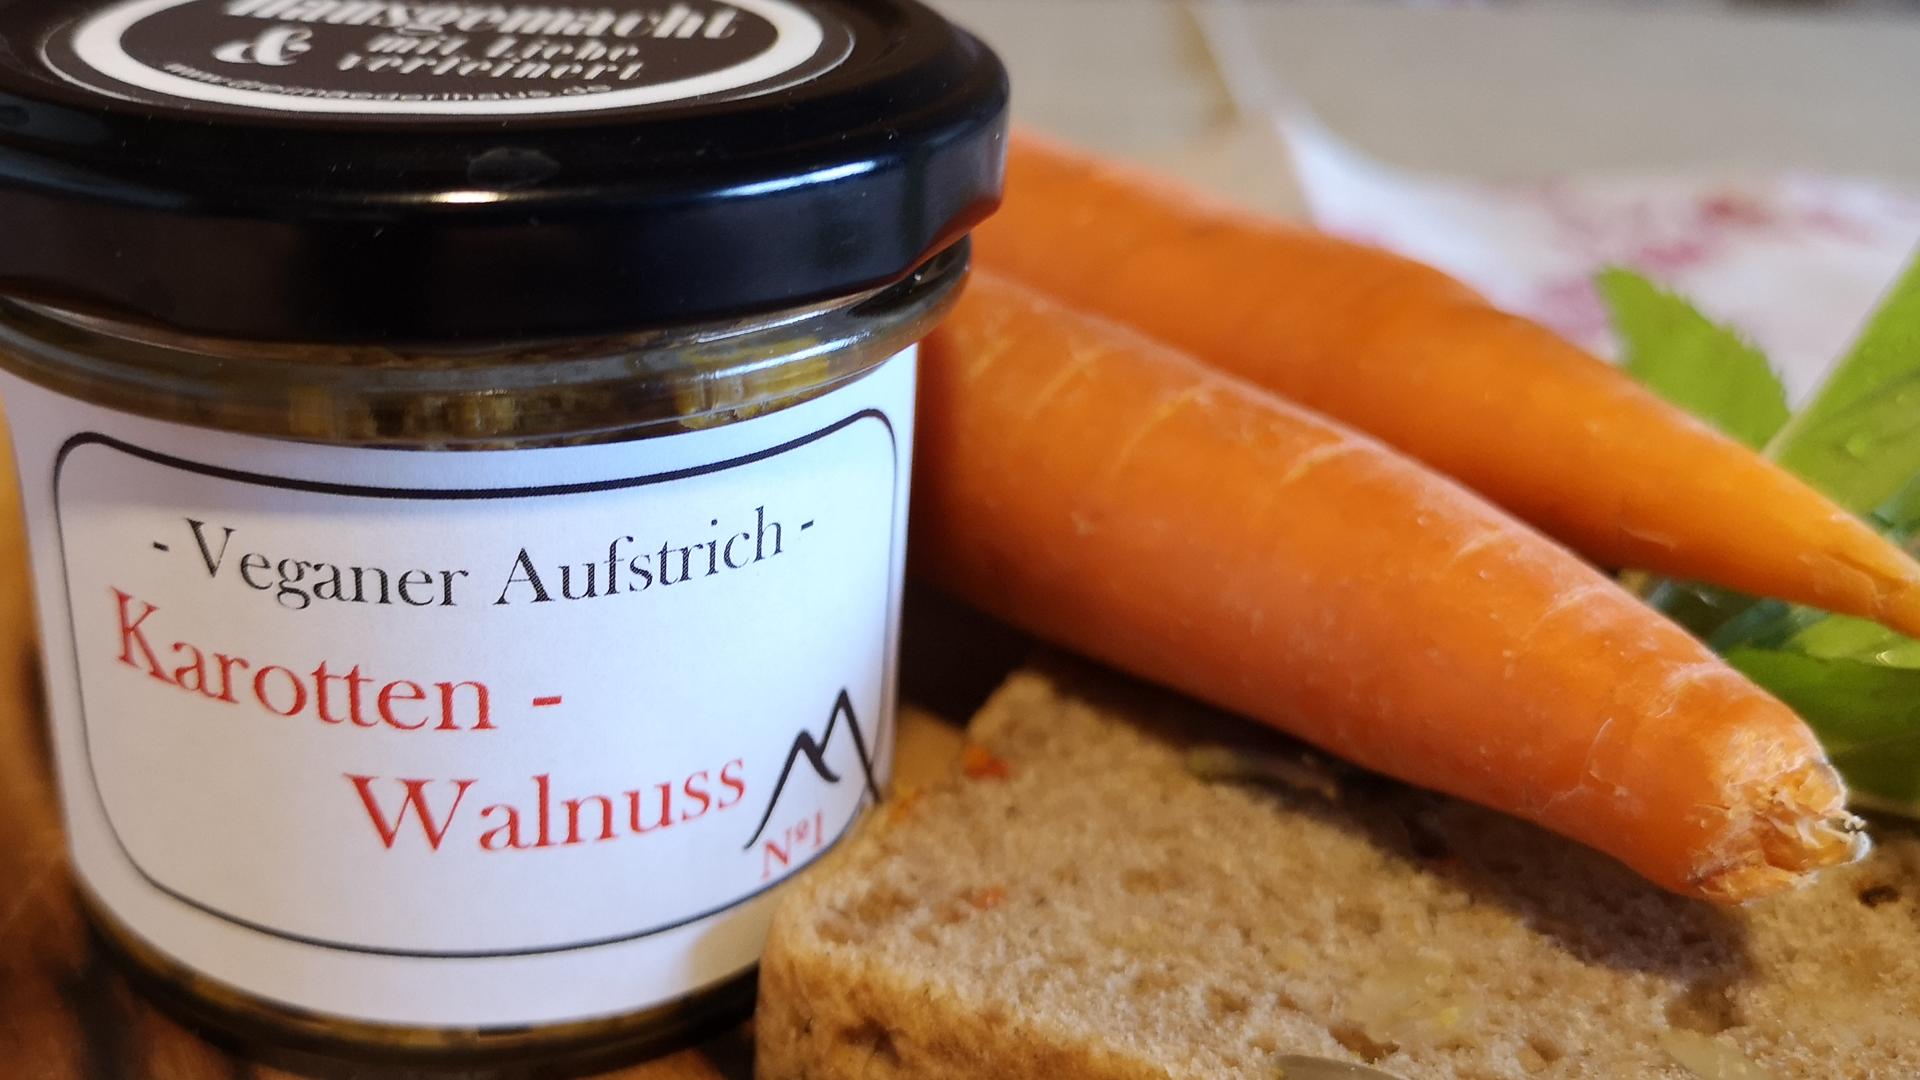 Karotten-Walnuss N°1 - 100gr